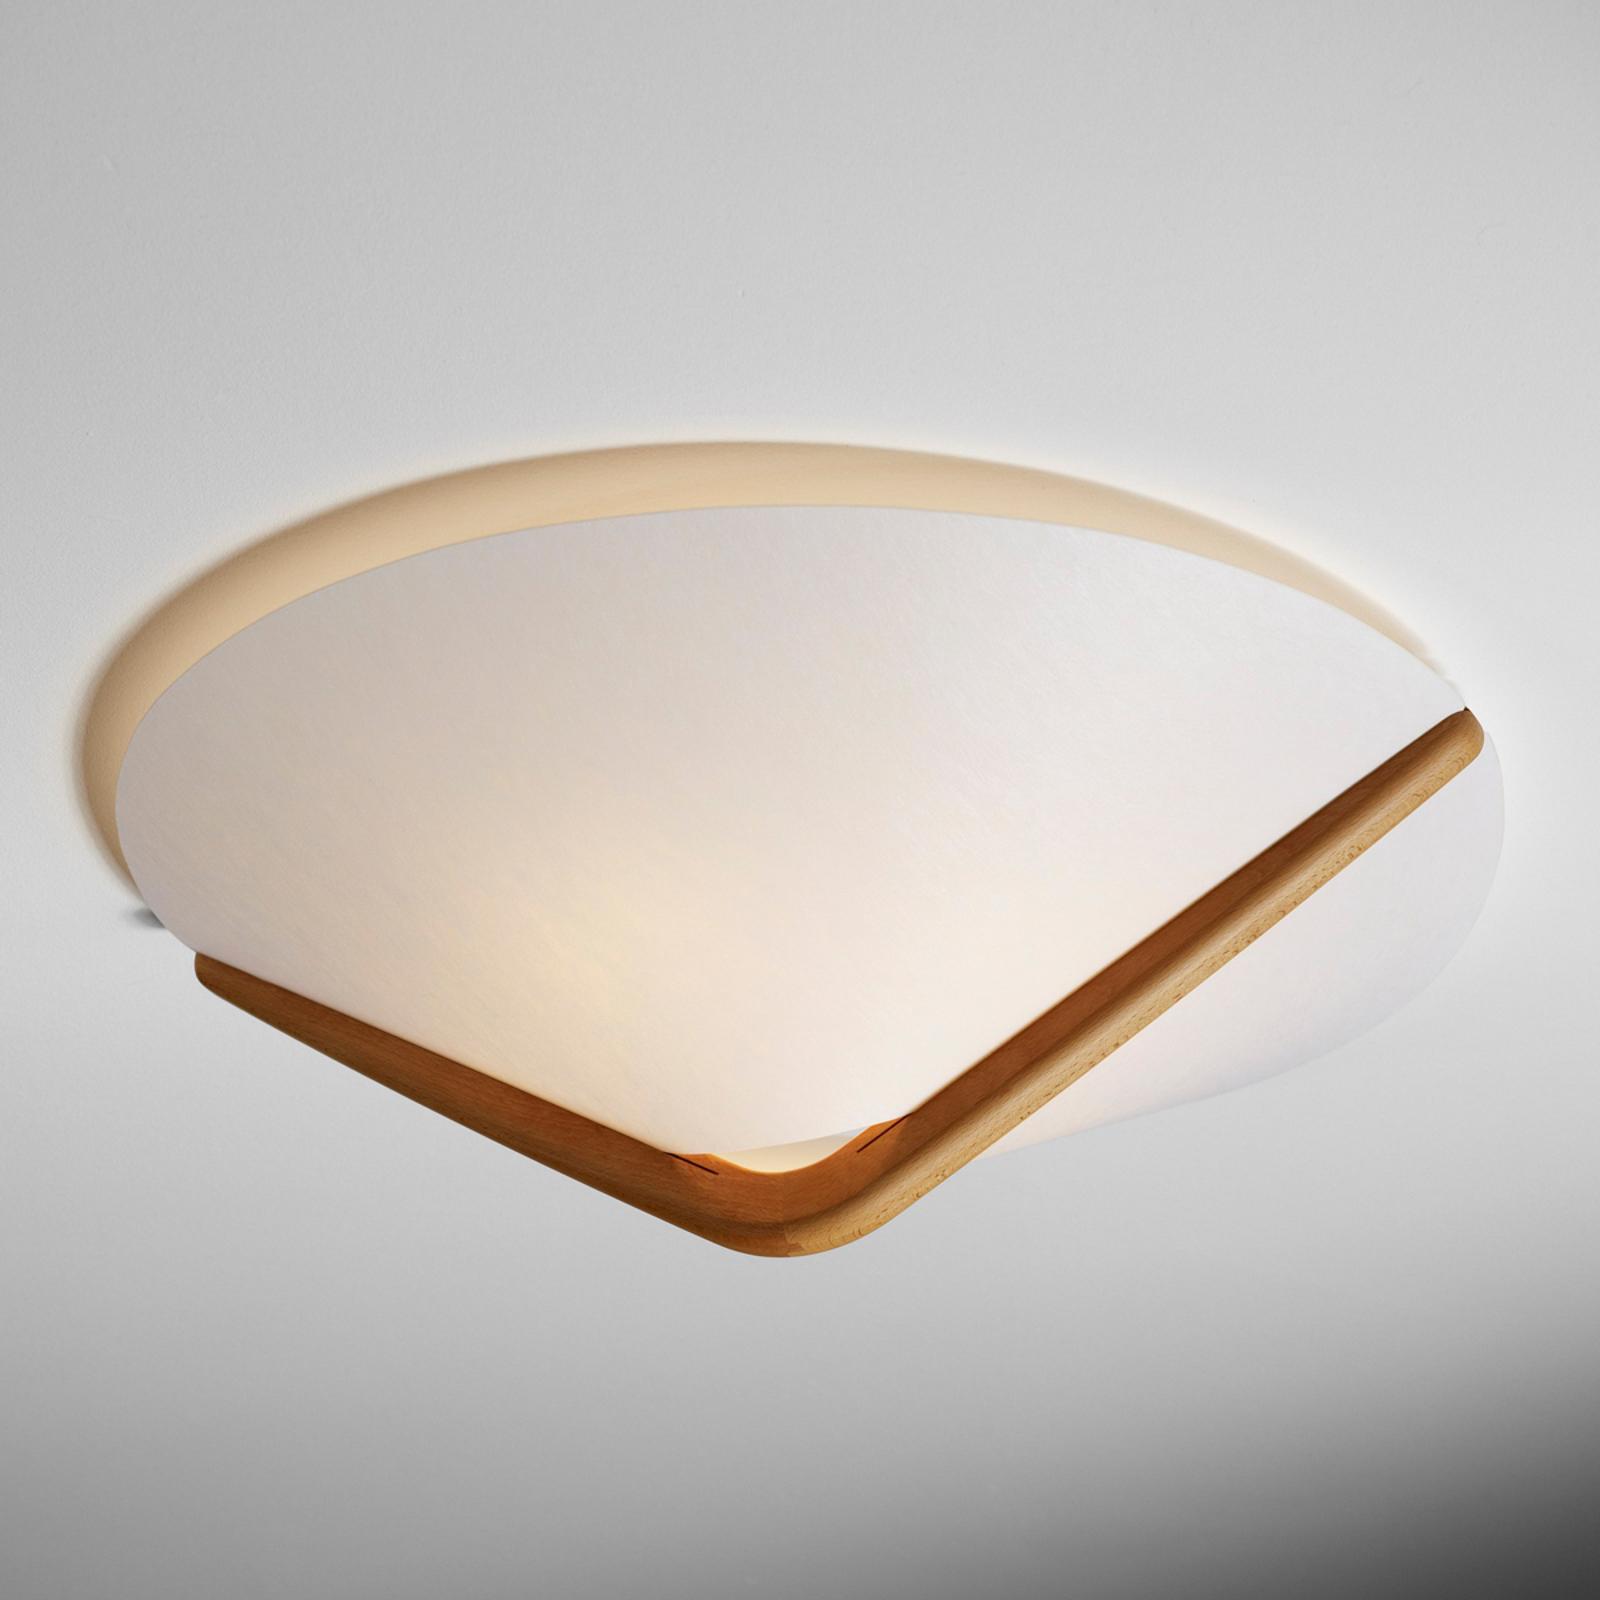 Trendy plafondlamp PILA